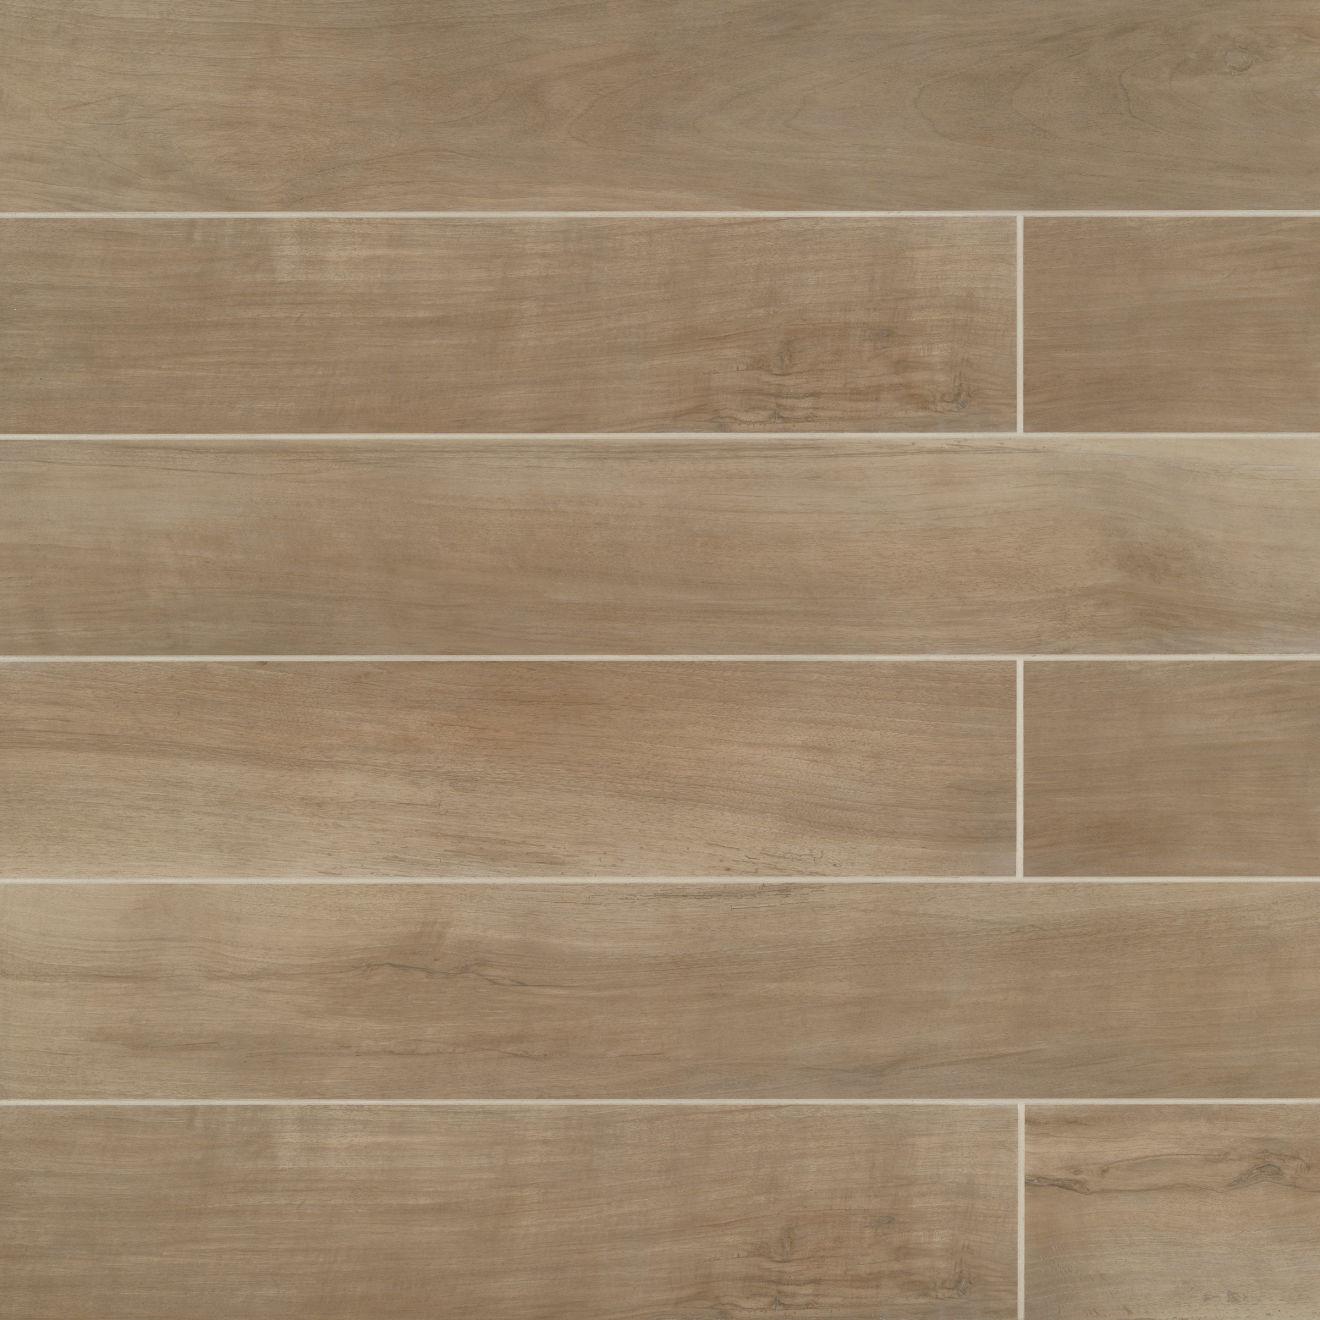 Antique 8.00 x 48.00 Floor & Wall Tile in Clay